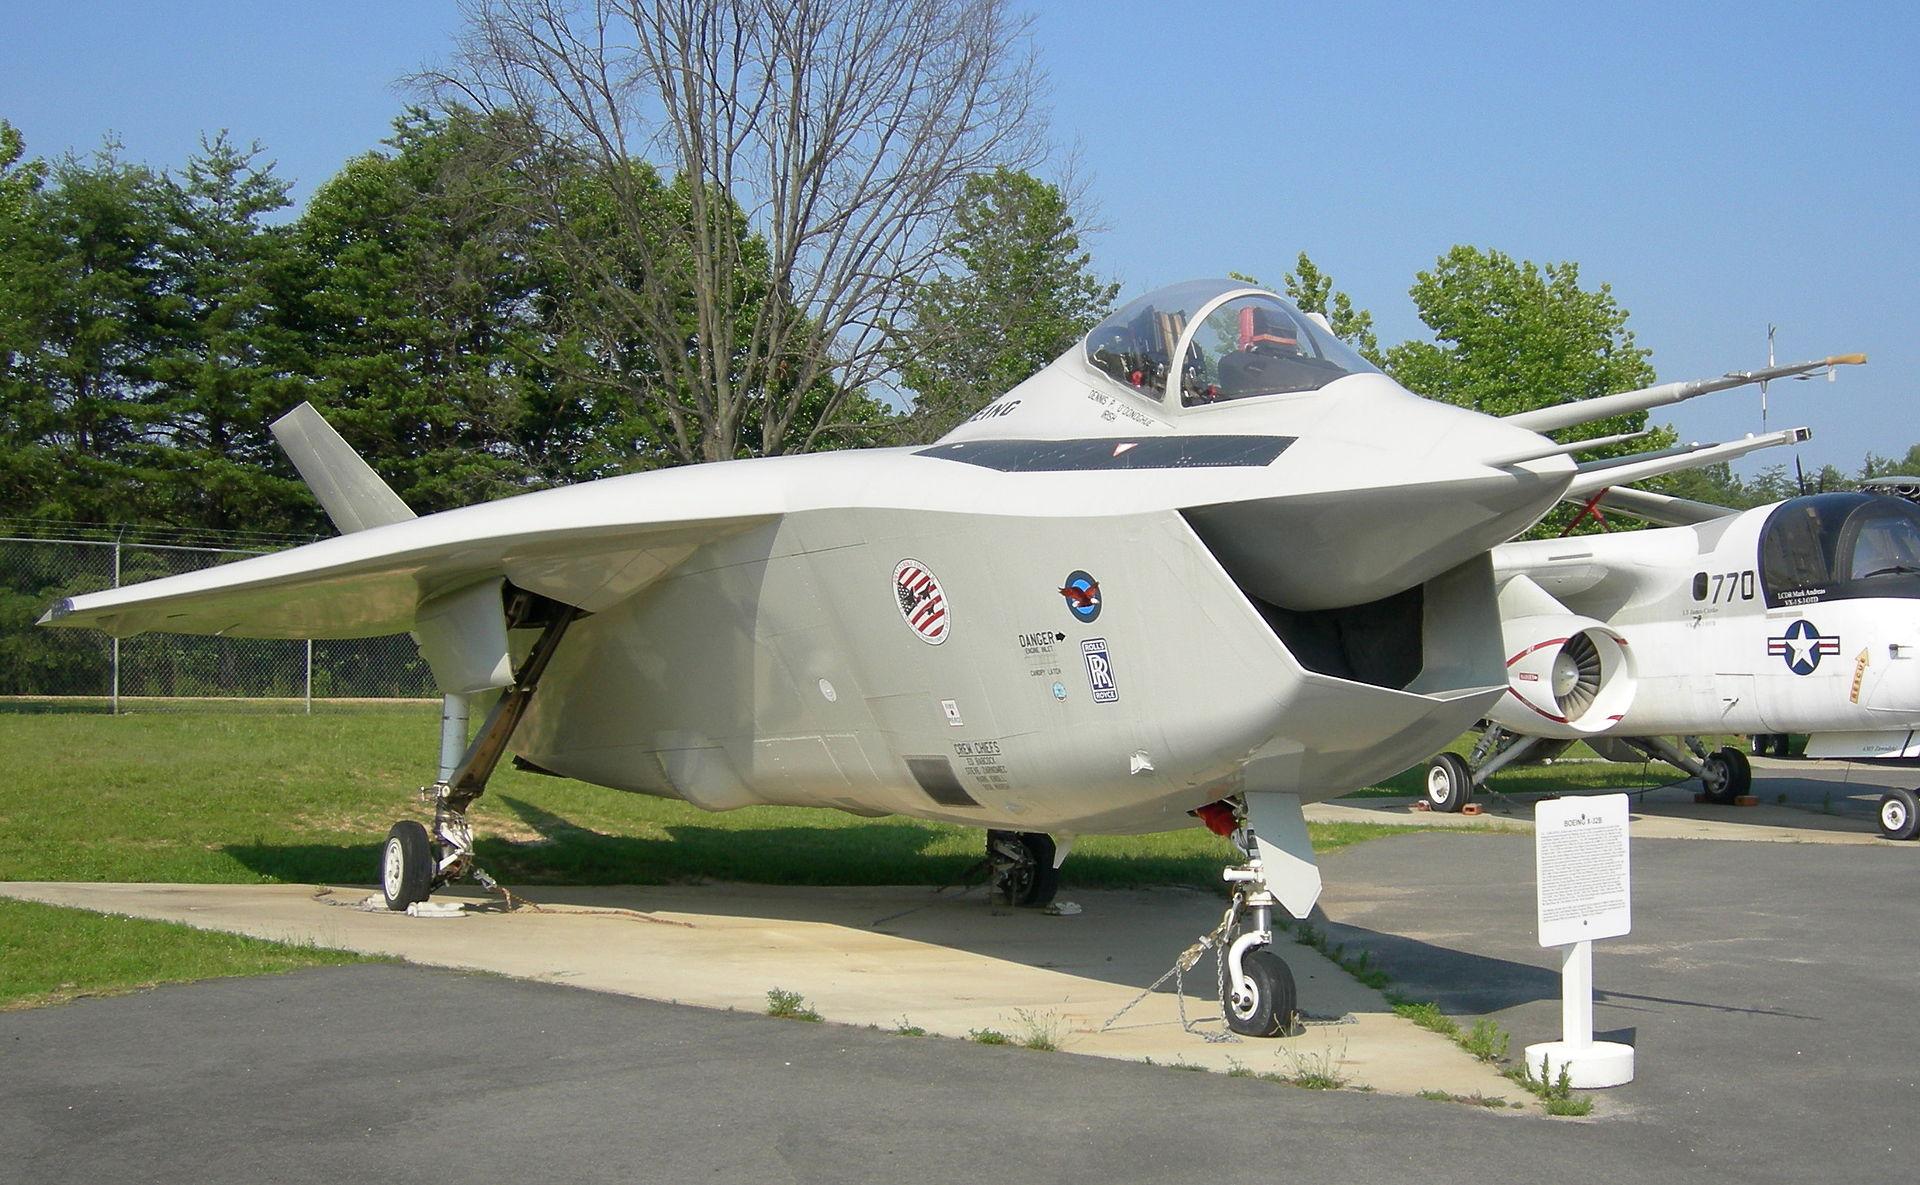 5th gen light mulltirole fighter/Mikoyan LMFS - Page 24 ?u=http%3A%2F%2Fnationalinterest.org%2Ffiles%2Fmain_images%2Fboeing_x-32b_patuxent